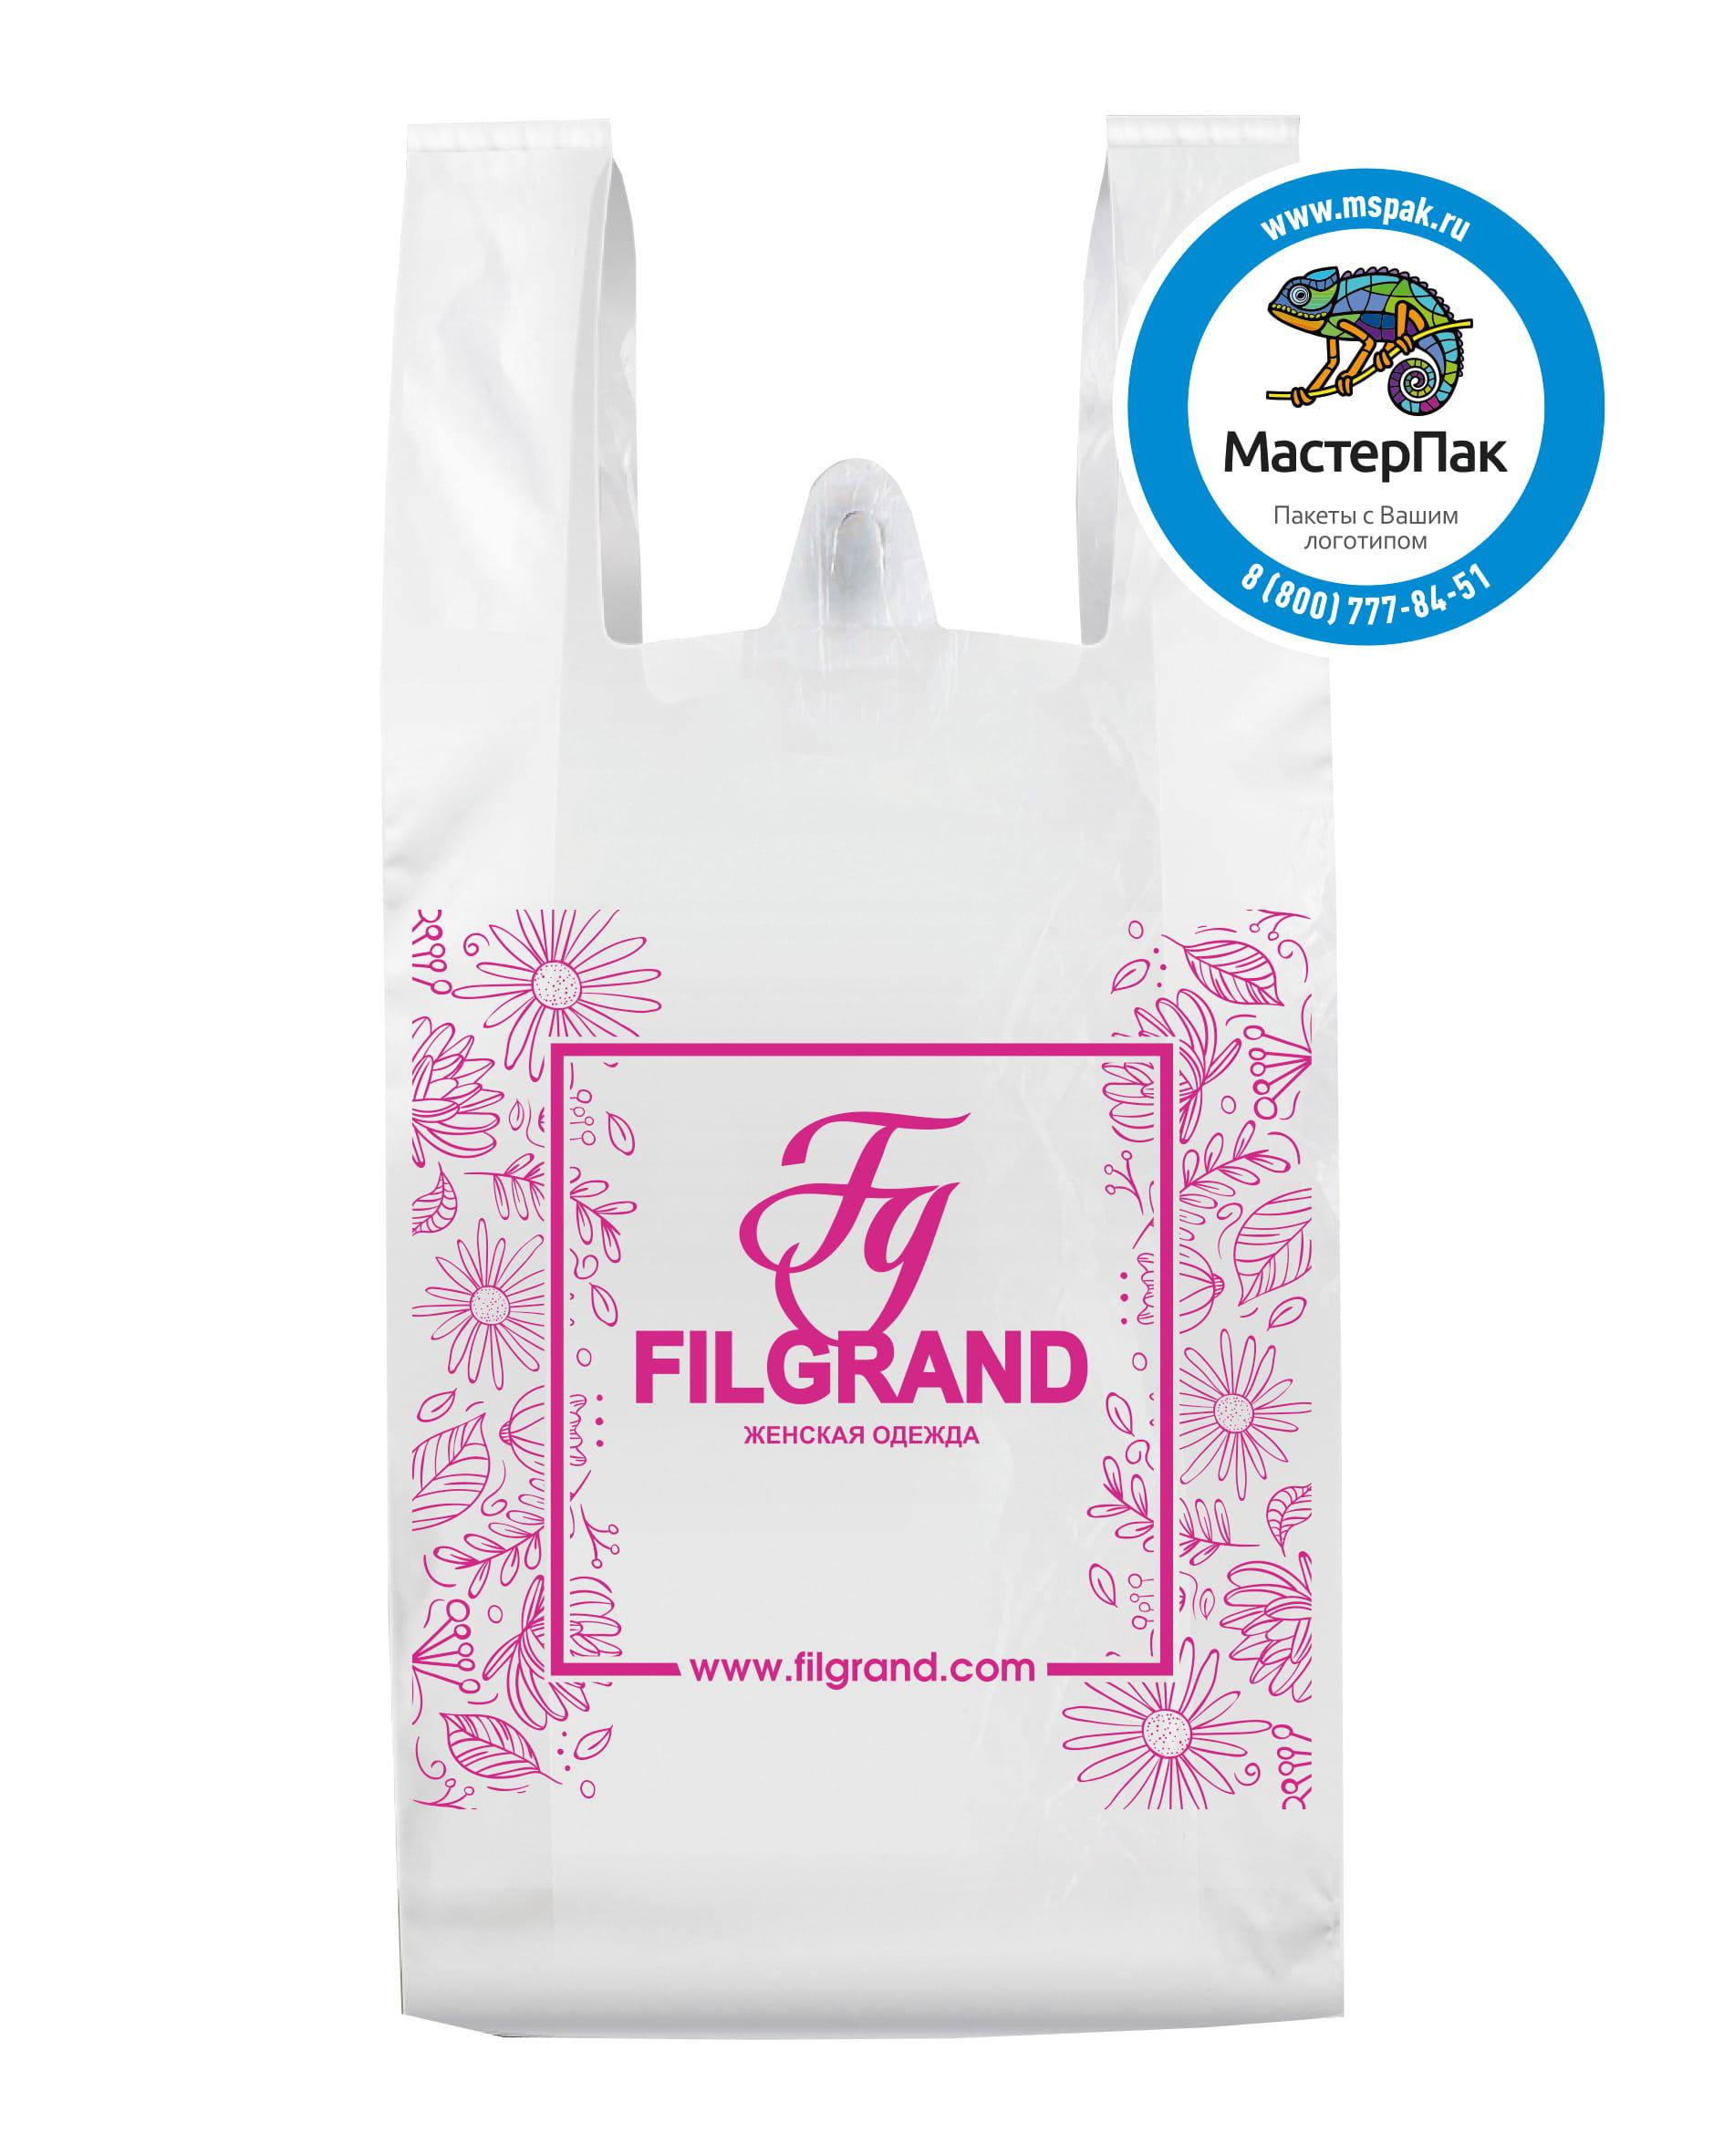 Пакет майка ПВД с логотипом магазина Filgrand, Чебоксары, 40*60, 30 мкм